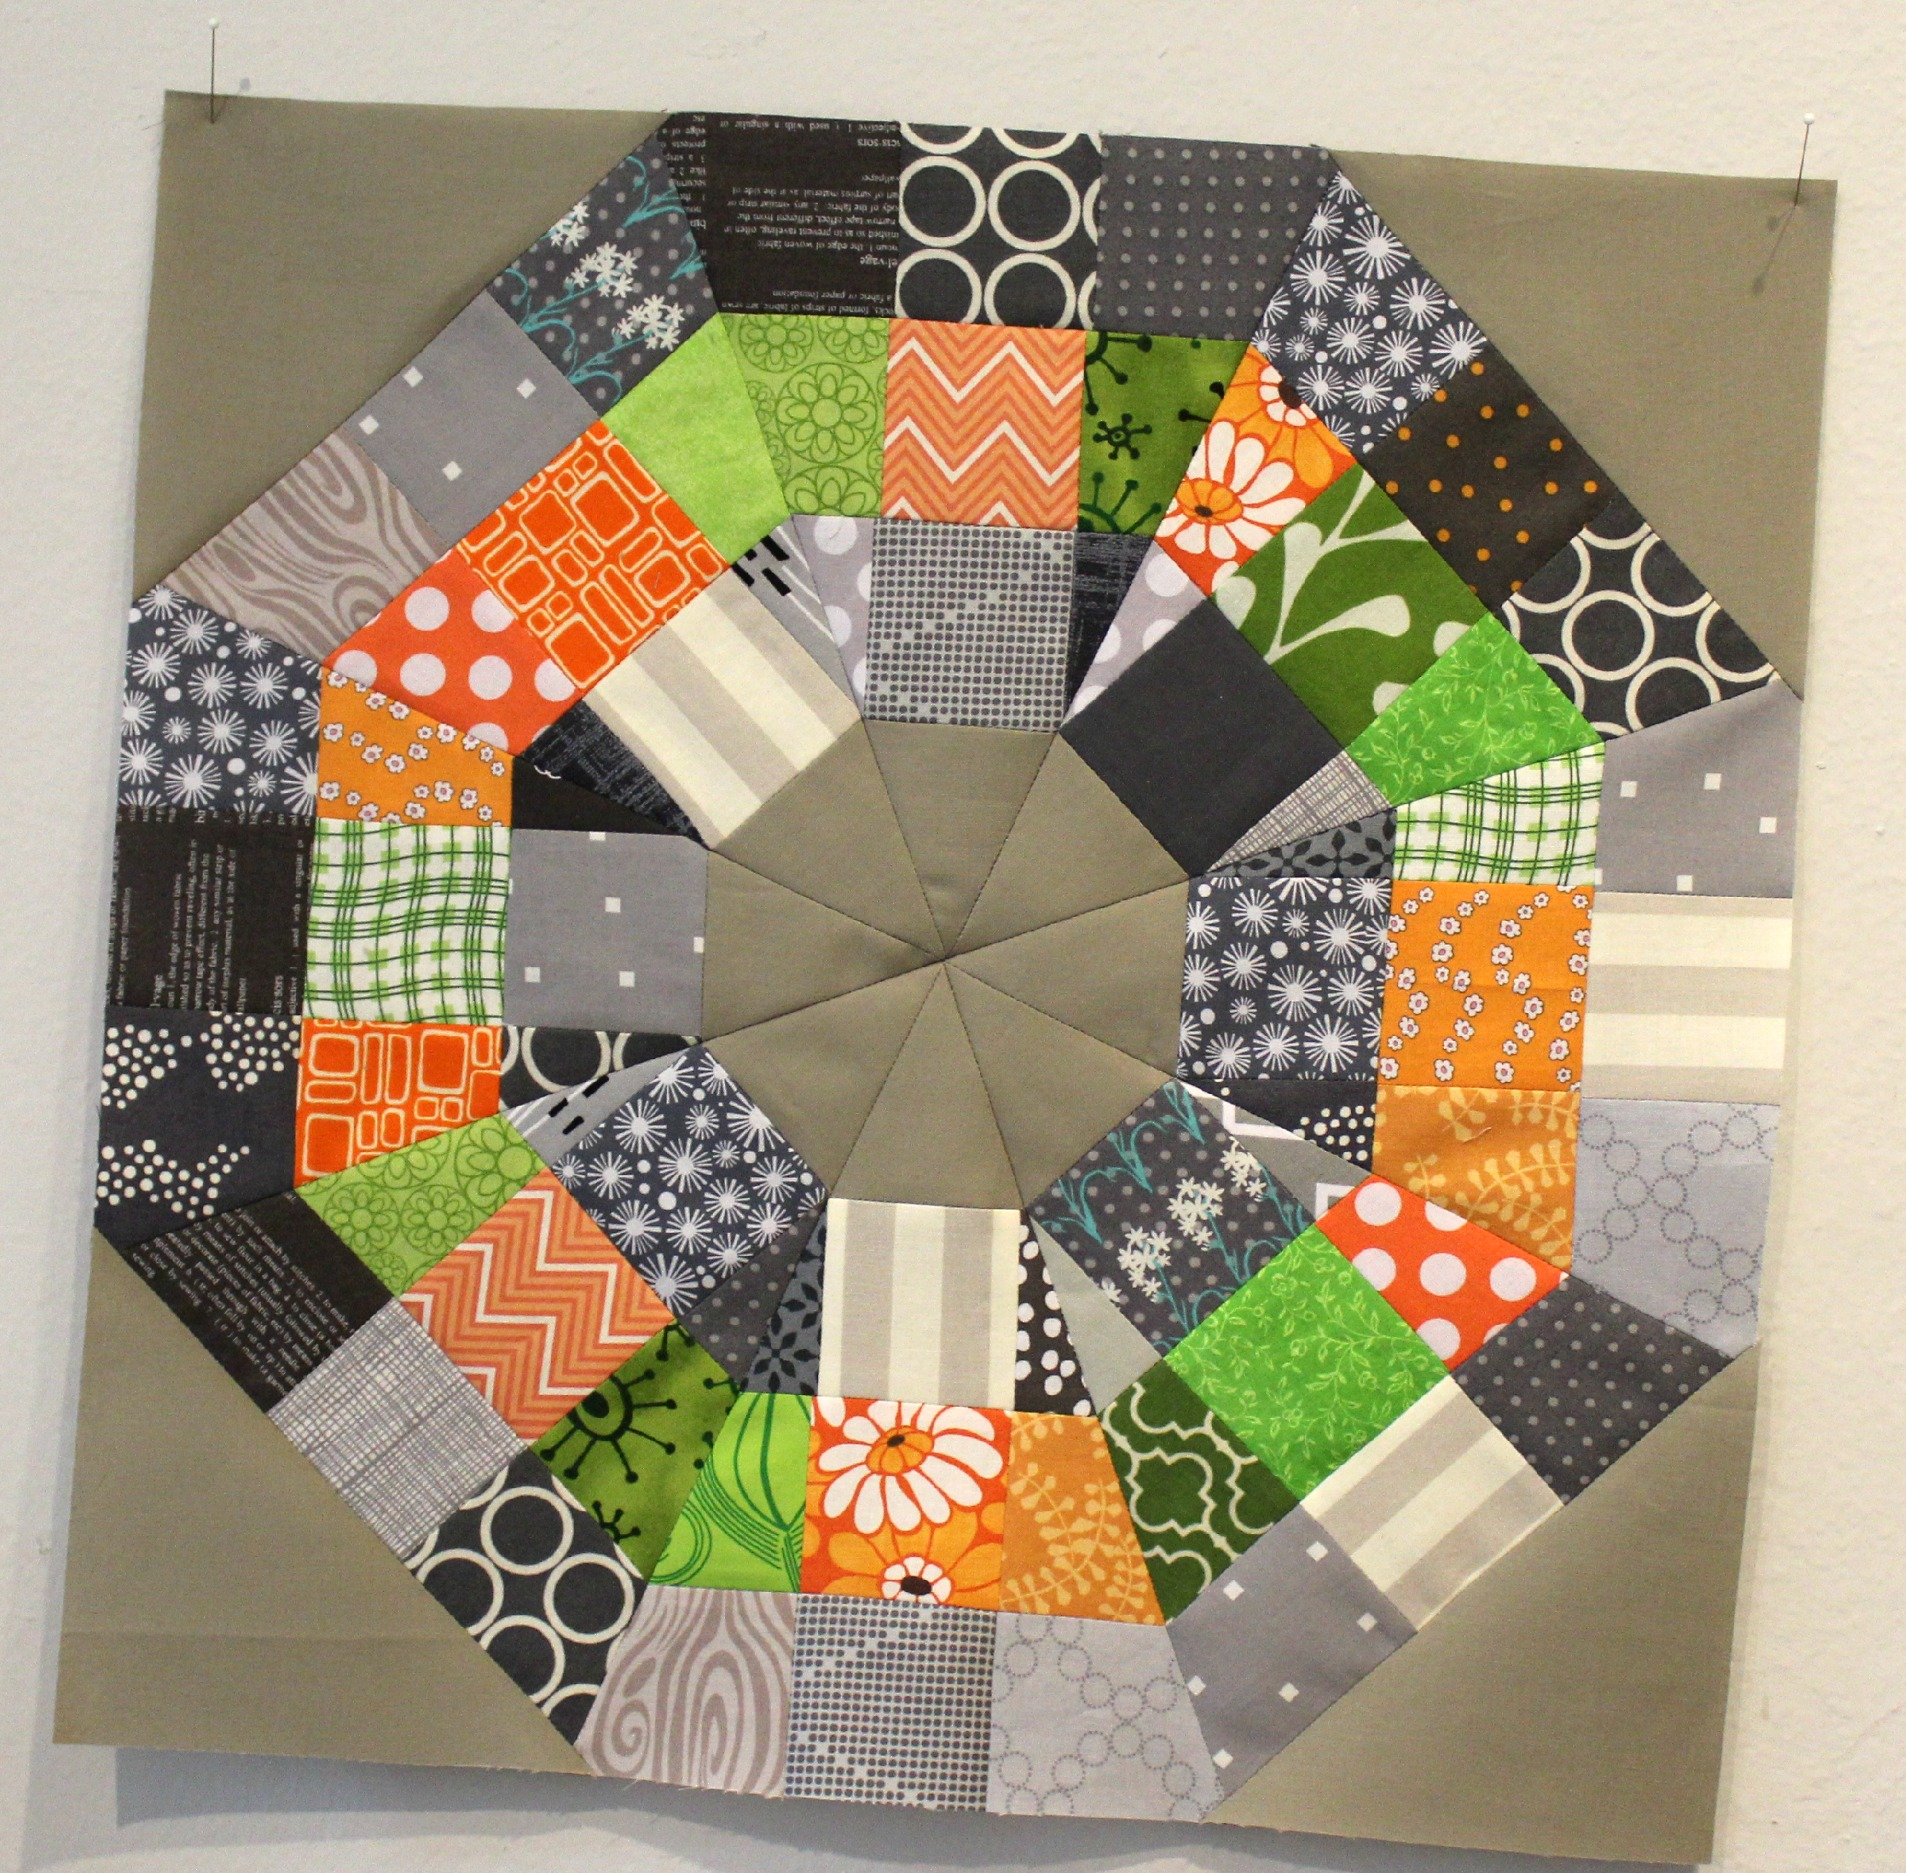 Octagonal Orb quilt block